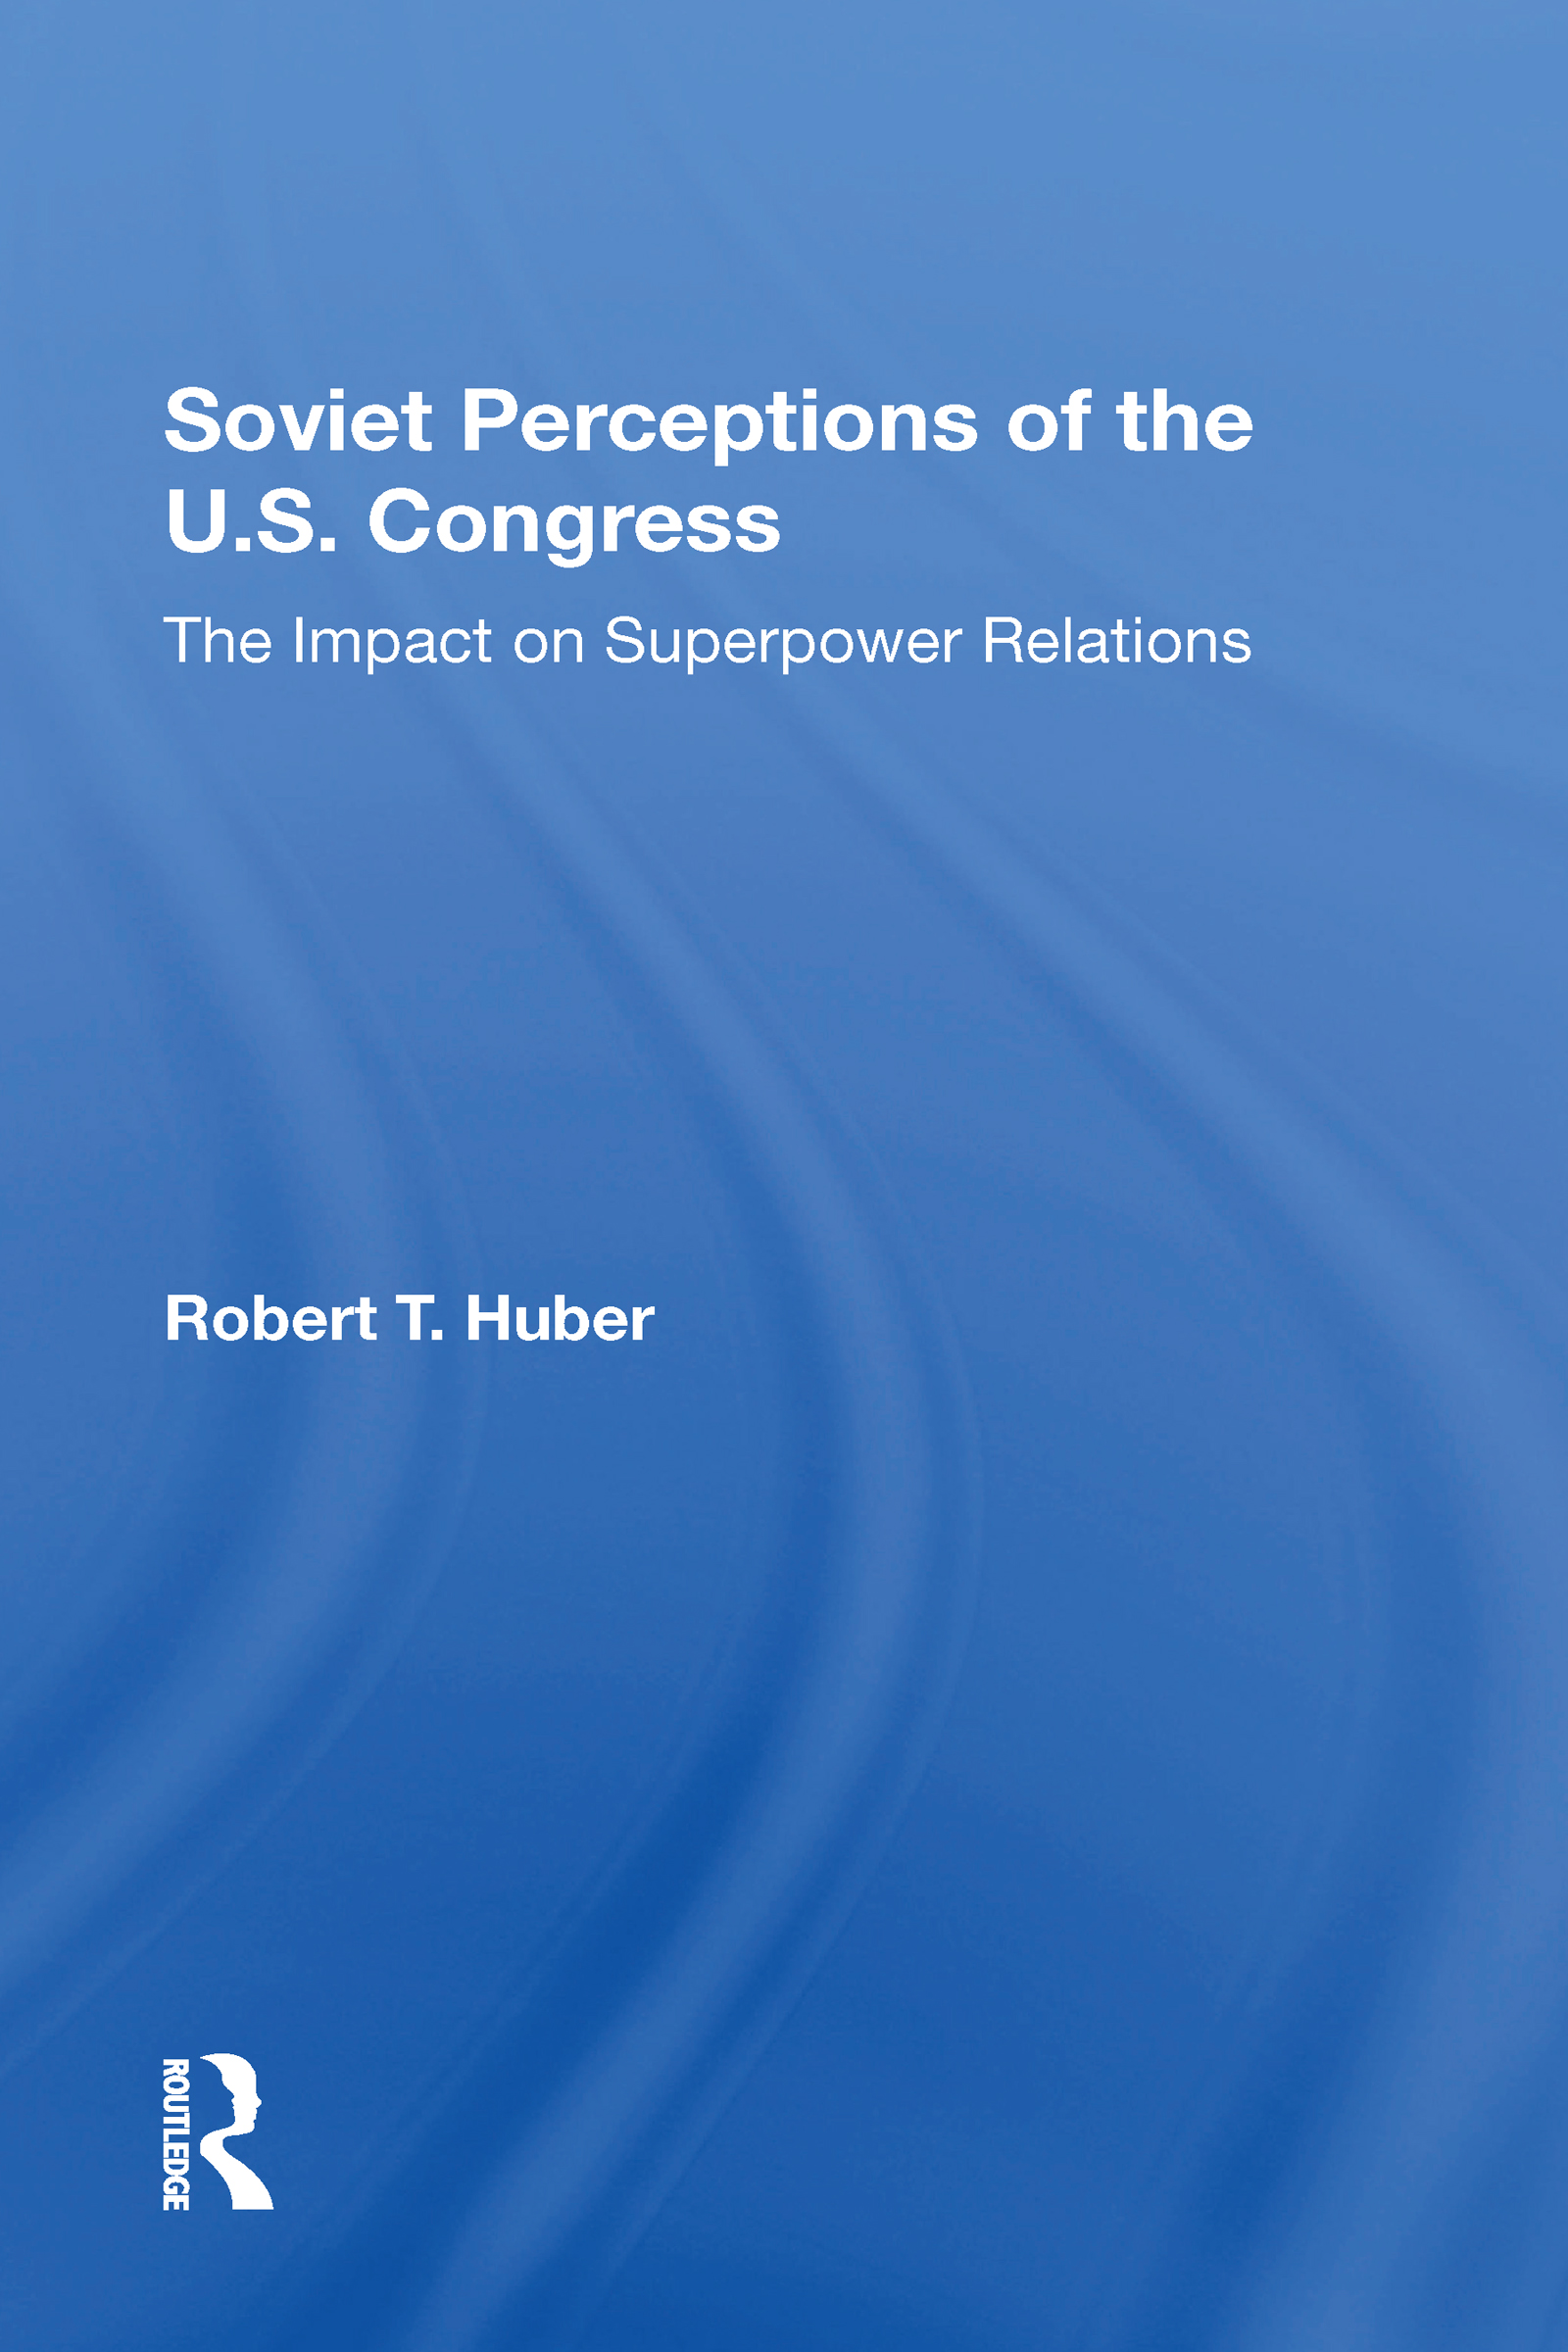 Soviet Perceptions Of The U.S. Congress